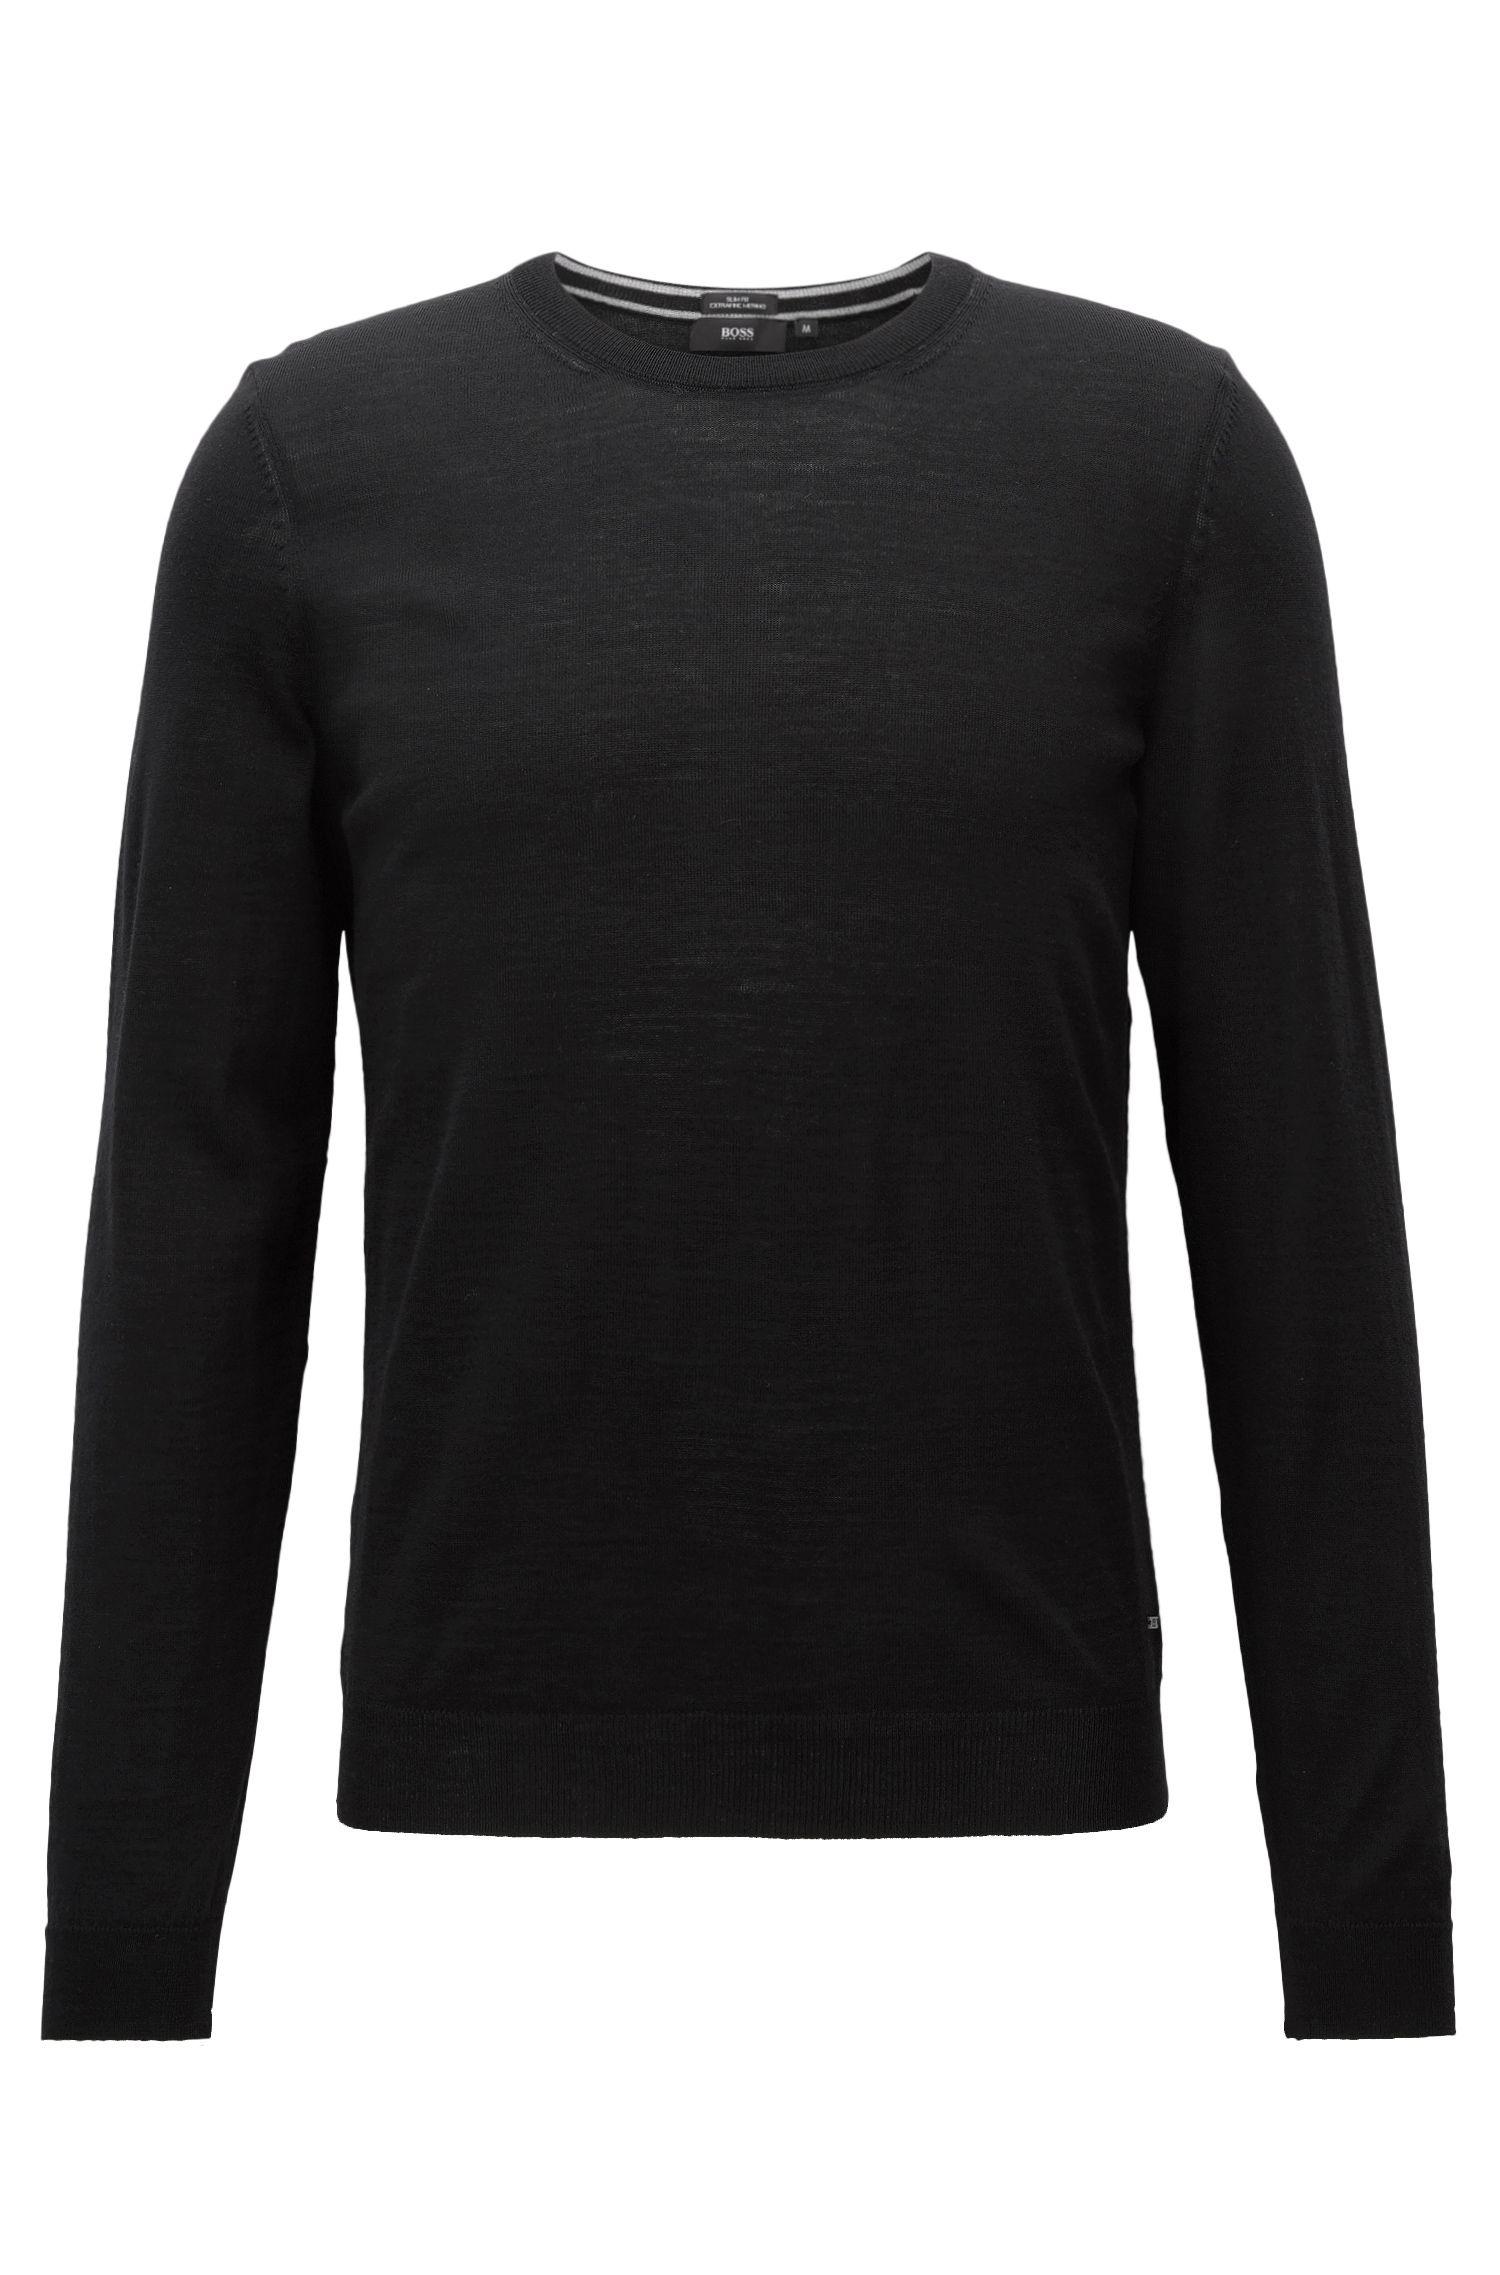 Extra-Fine Merino Wool Sweater   Leno N